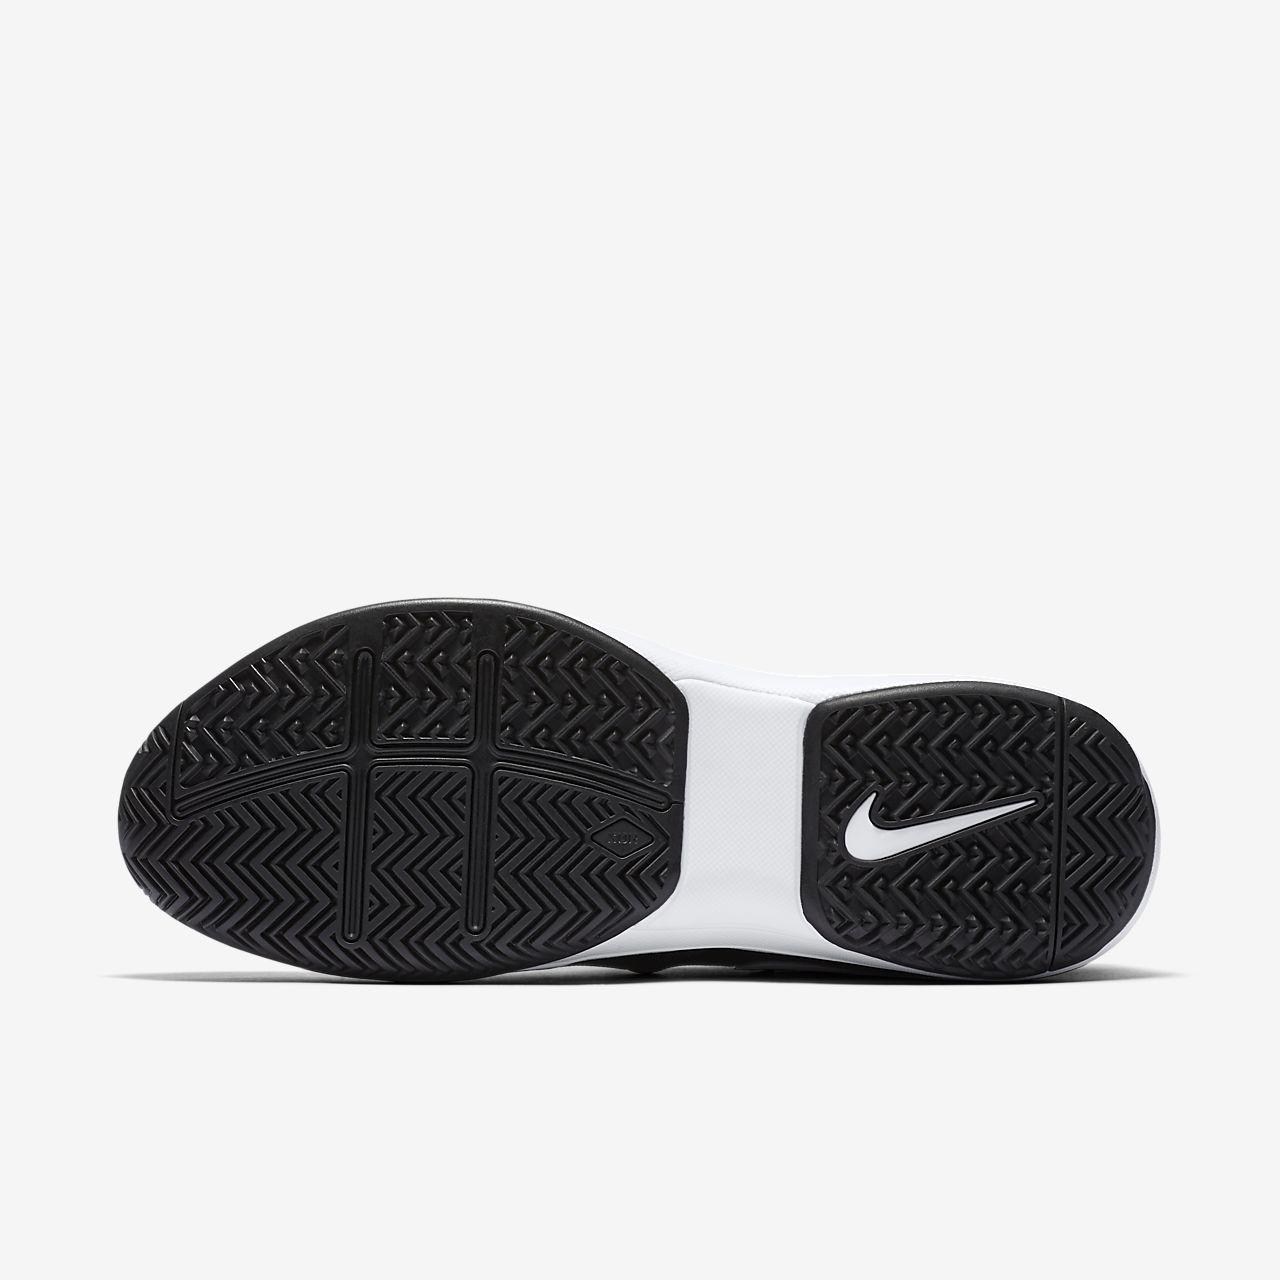 a7696acb358e NikeCourt Air Zoom Prestige Men s Hard Court Tennis Shoe. Nike.com AU